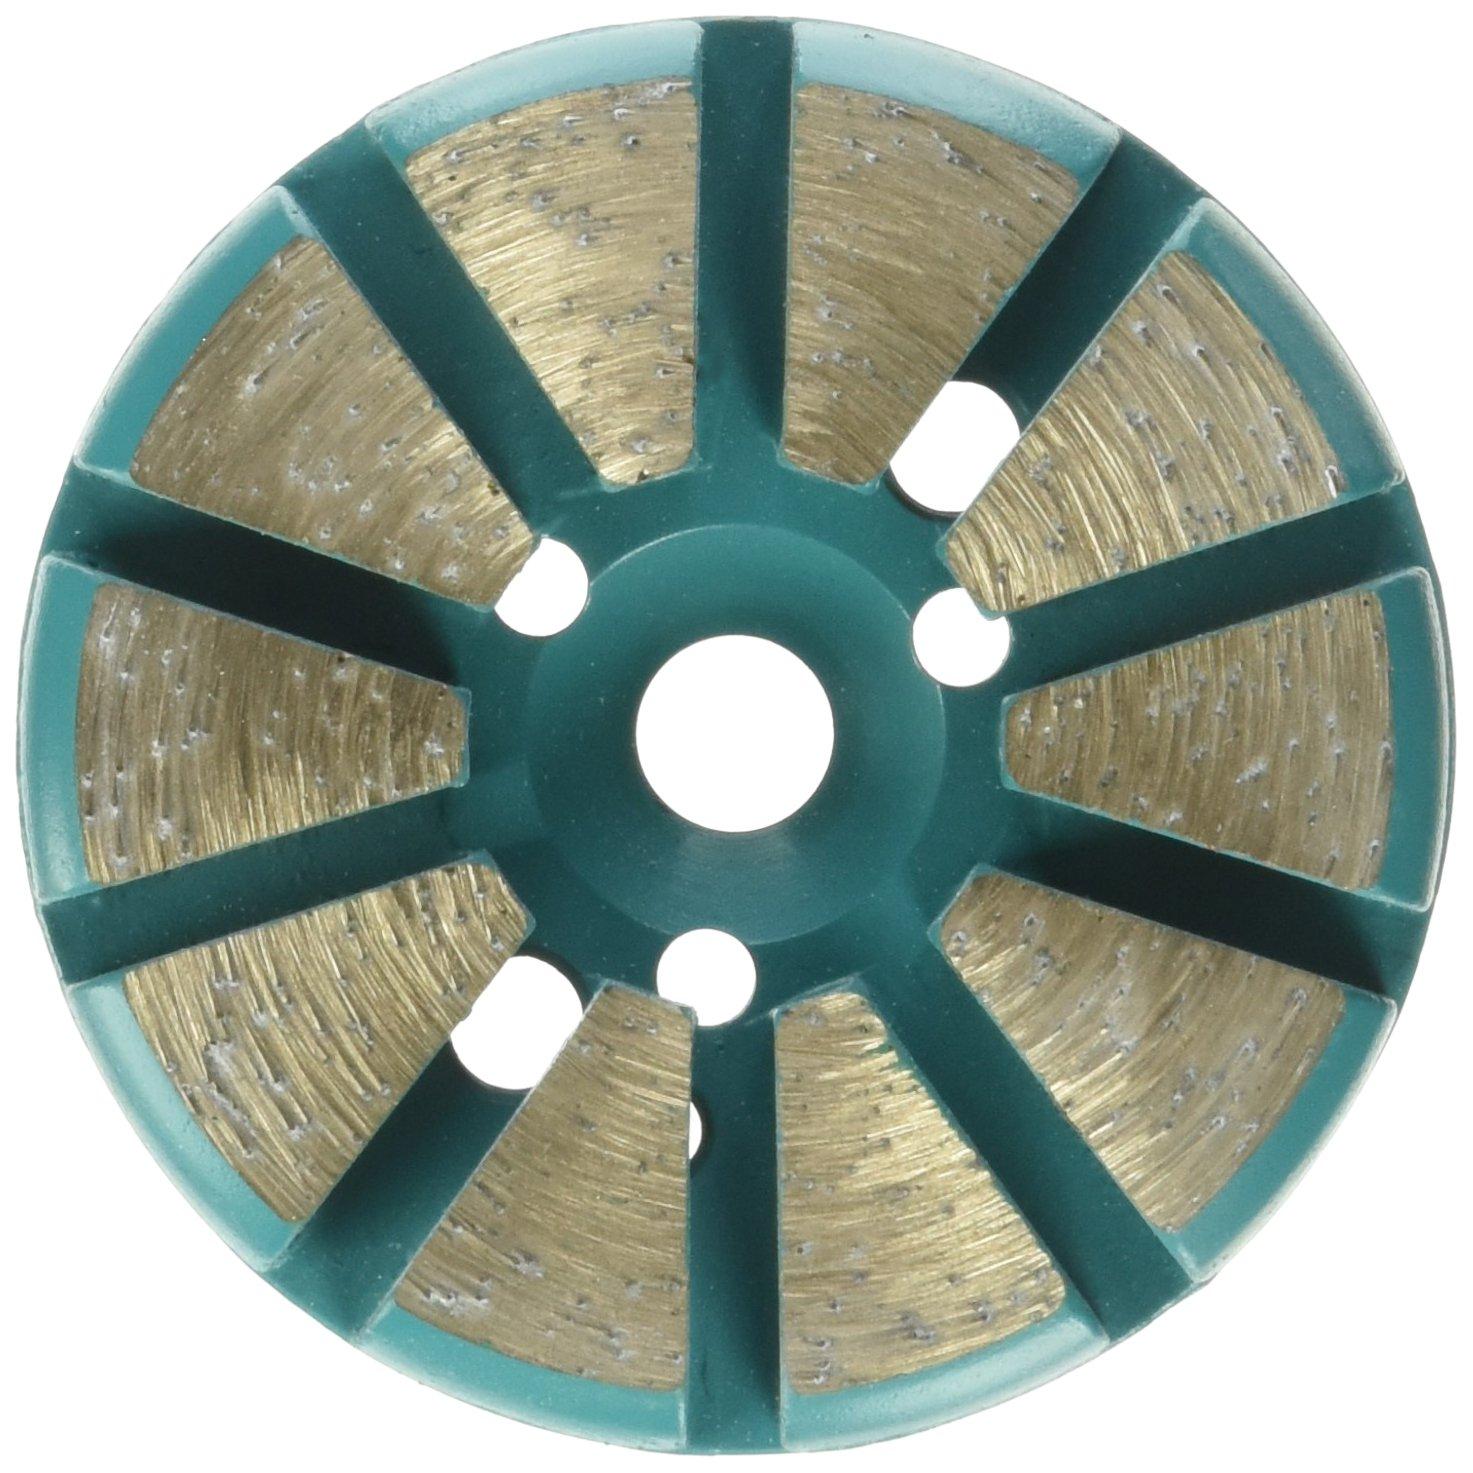 Toolocity MFP3030 3-Inch 30 Grit Multi-Mach Metal Bond Diamond Floor Grinding Disc